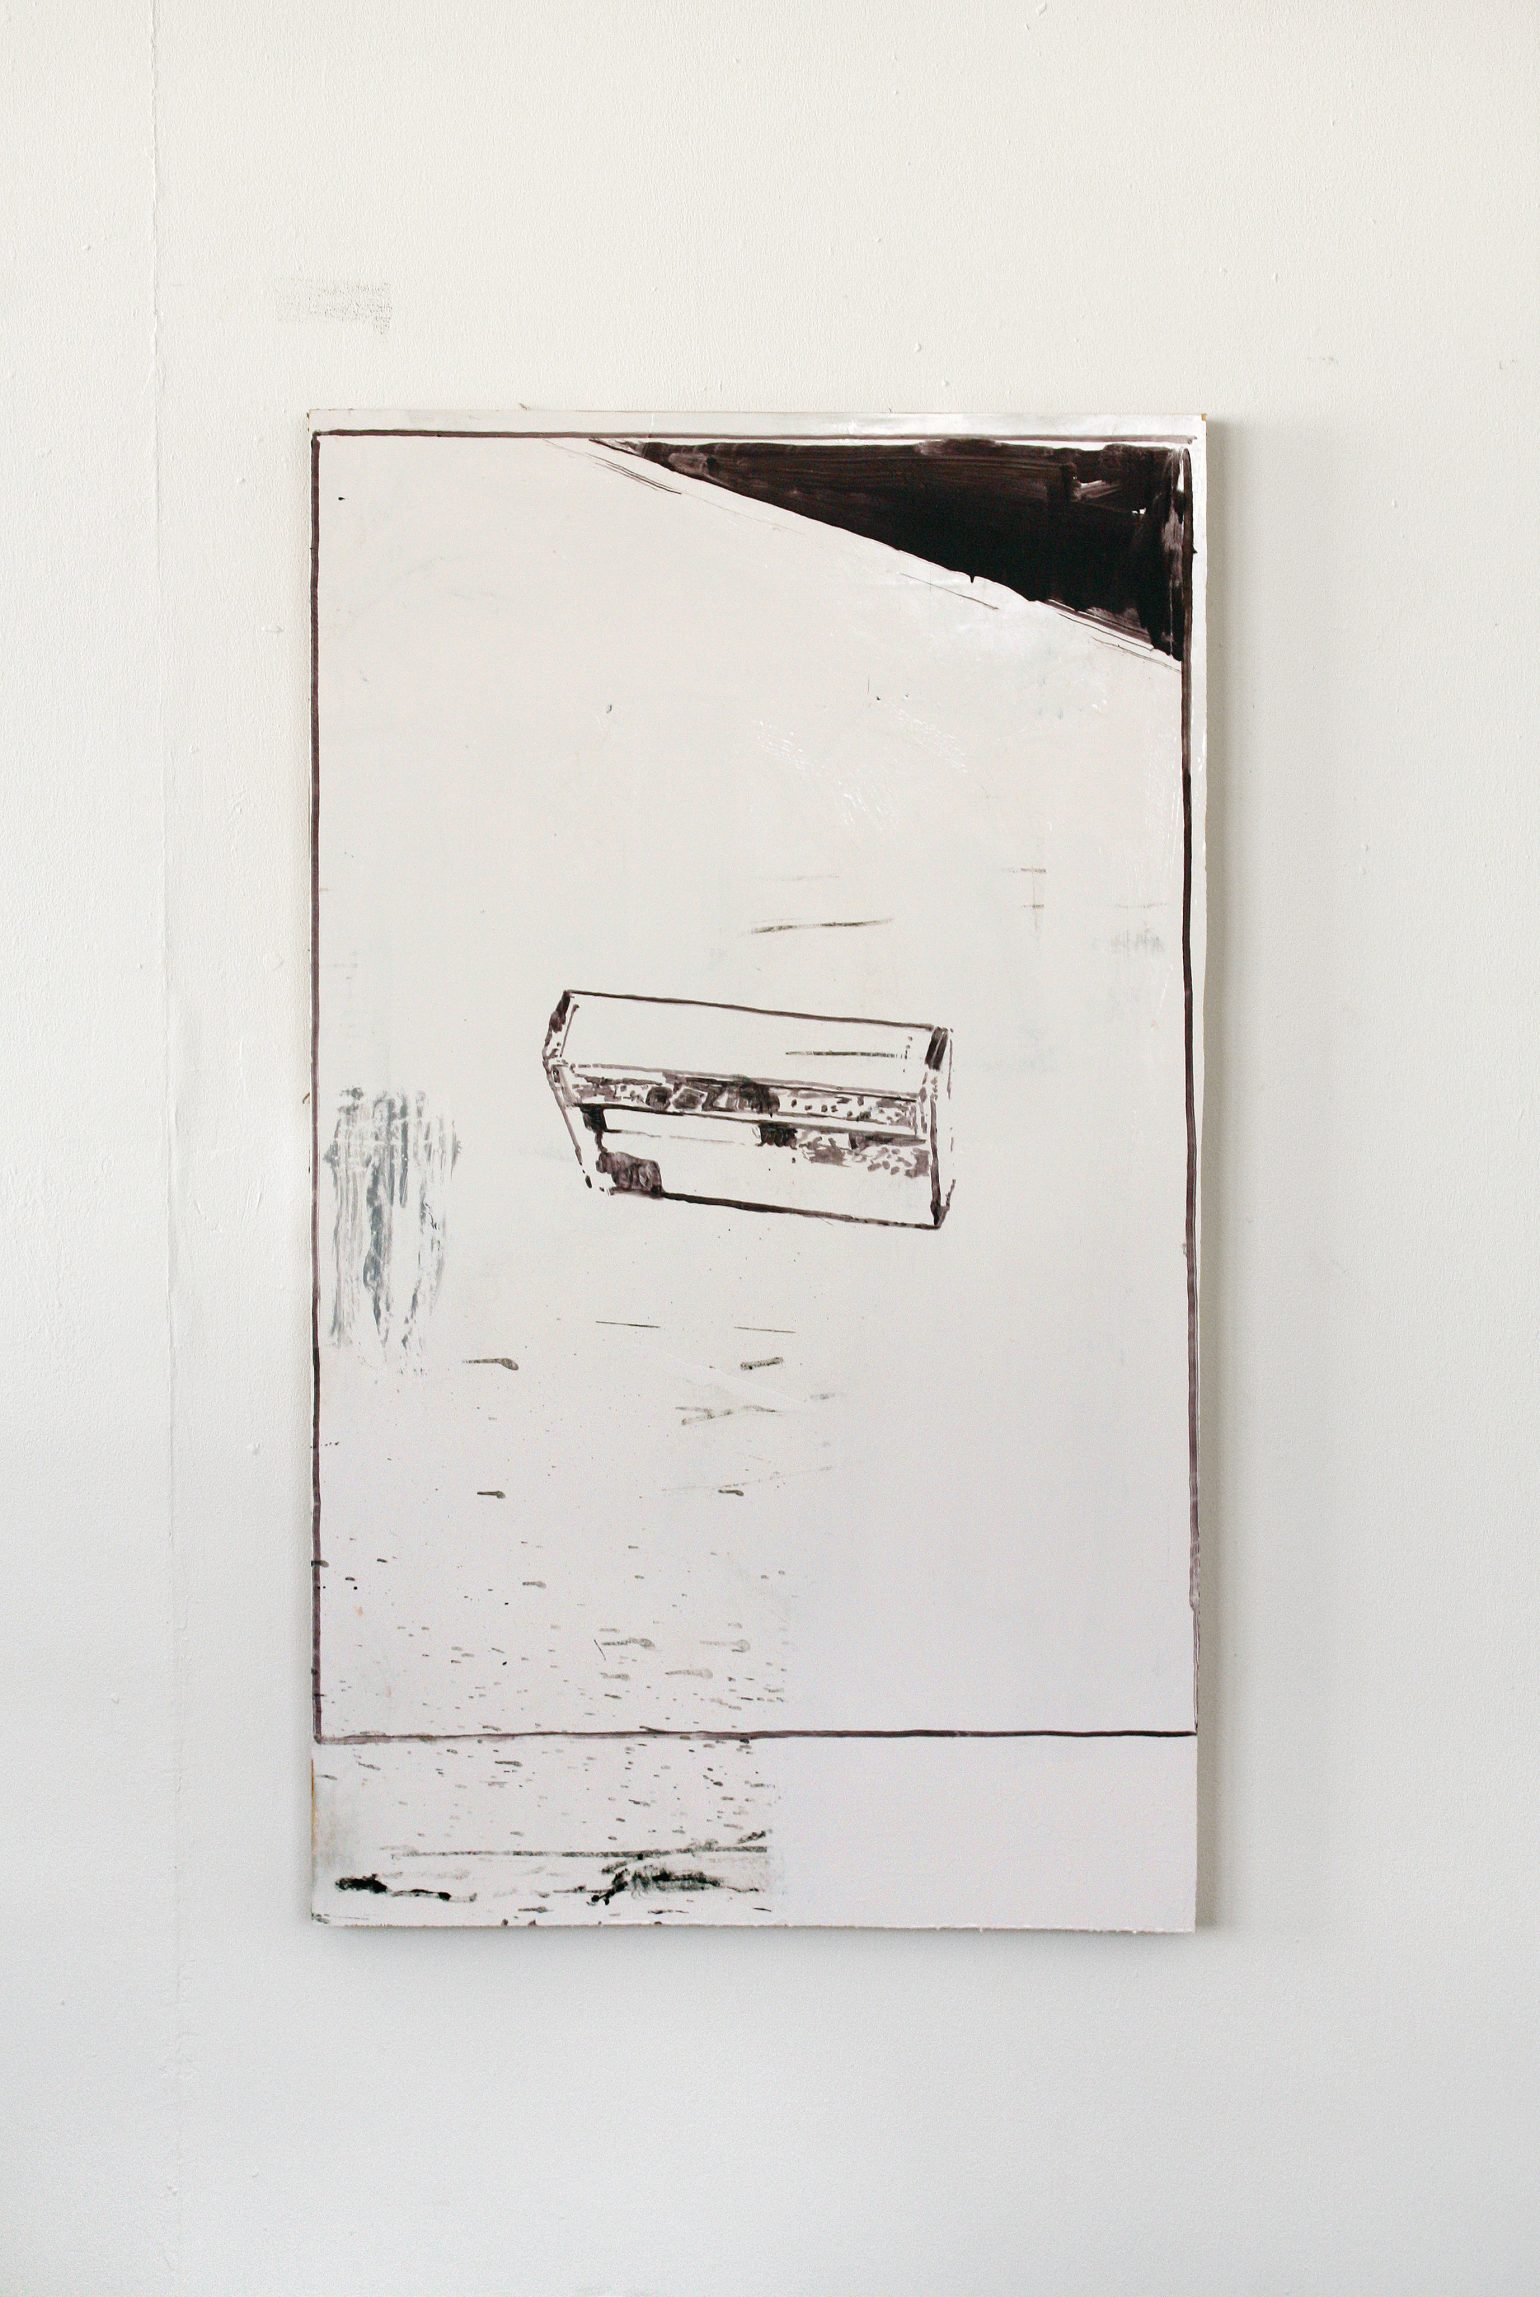 sk82002+carcrash tape copia 2